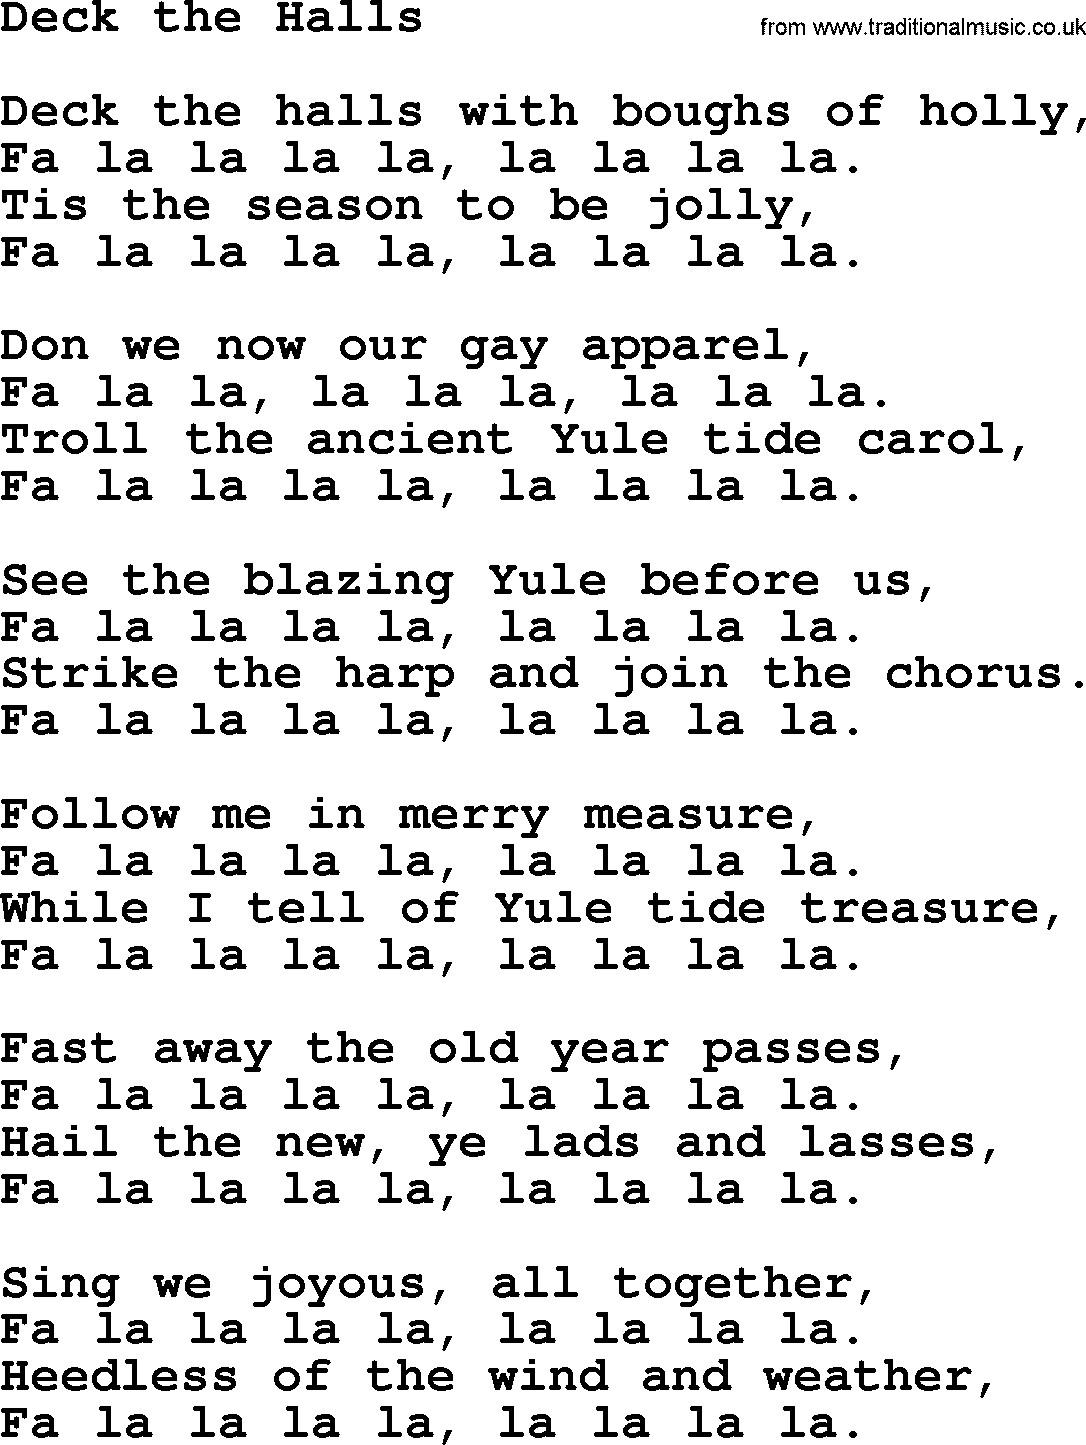 Christmas Songs Deck The Hall  Christmas Hymns Carols and Songs title Deck The Halls